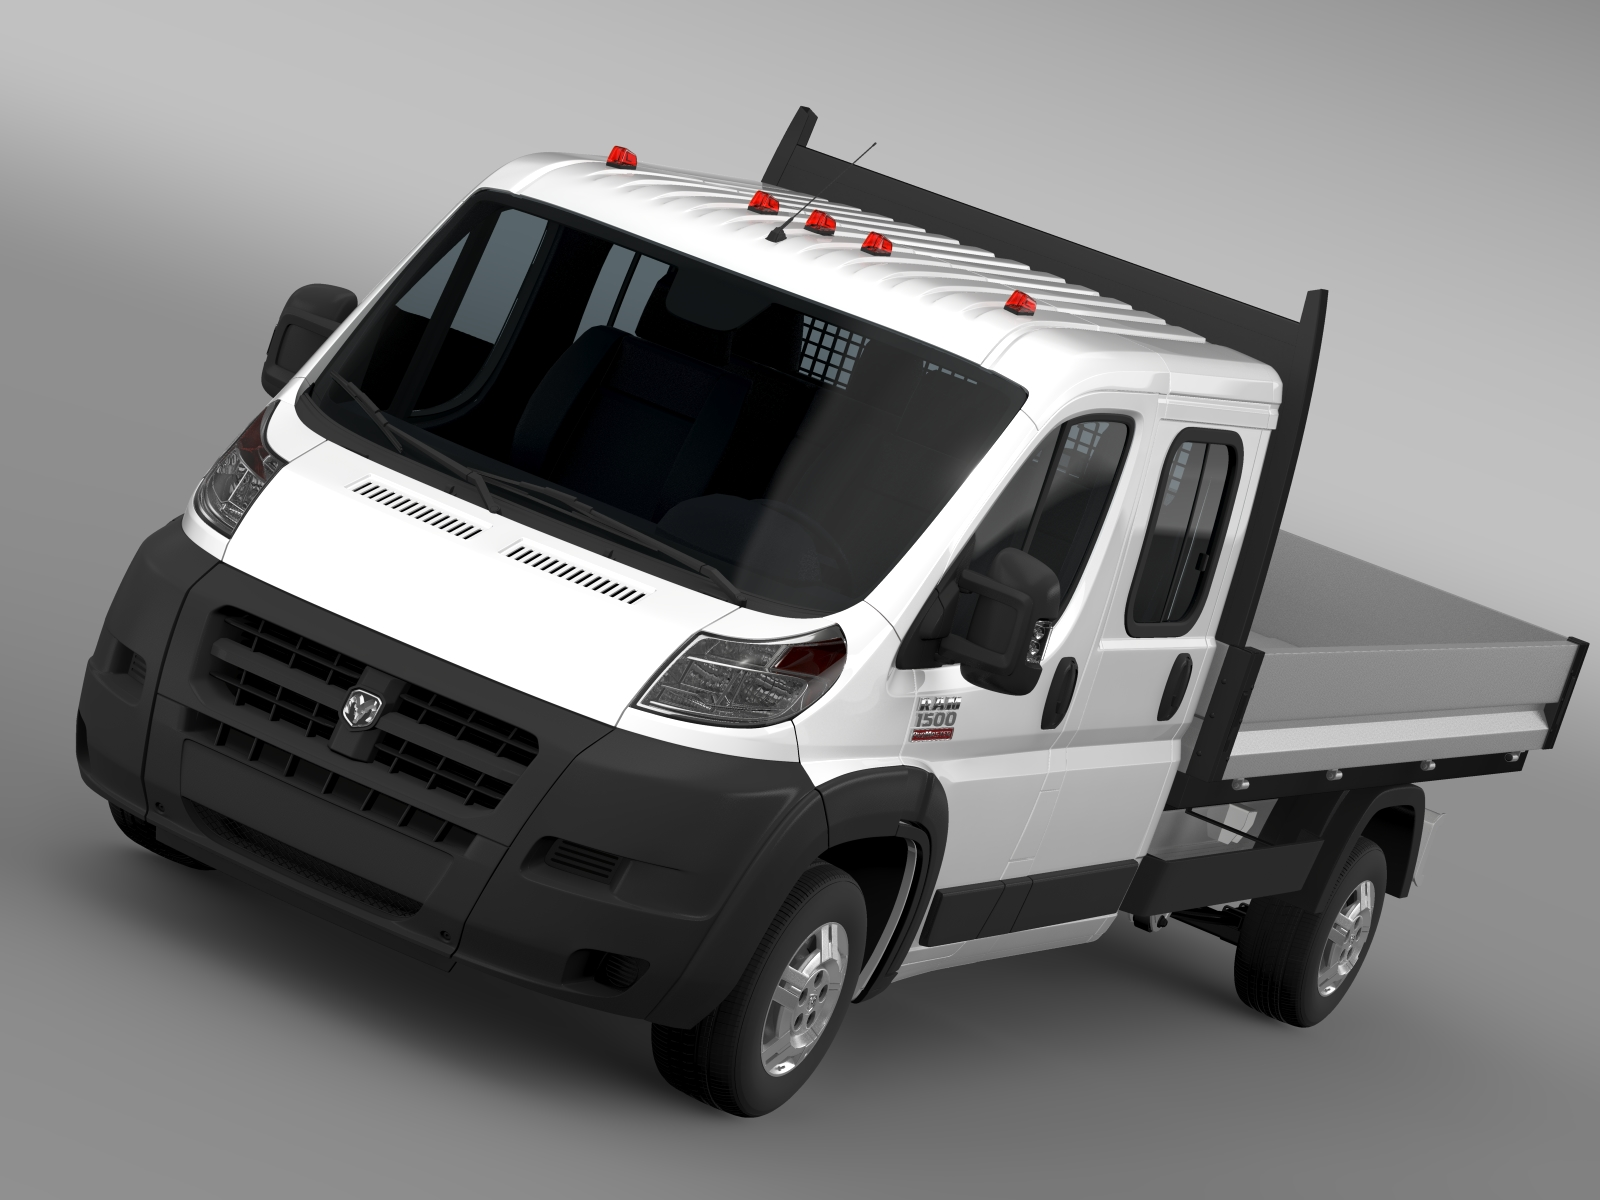 ram promaster cargo crew cab truck 2015 3d model 3ds max fbx c4d lwo ma mb hrc xsi obj 218801